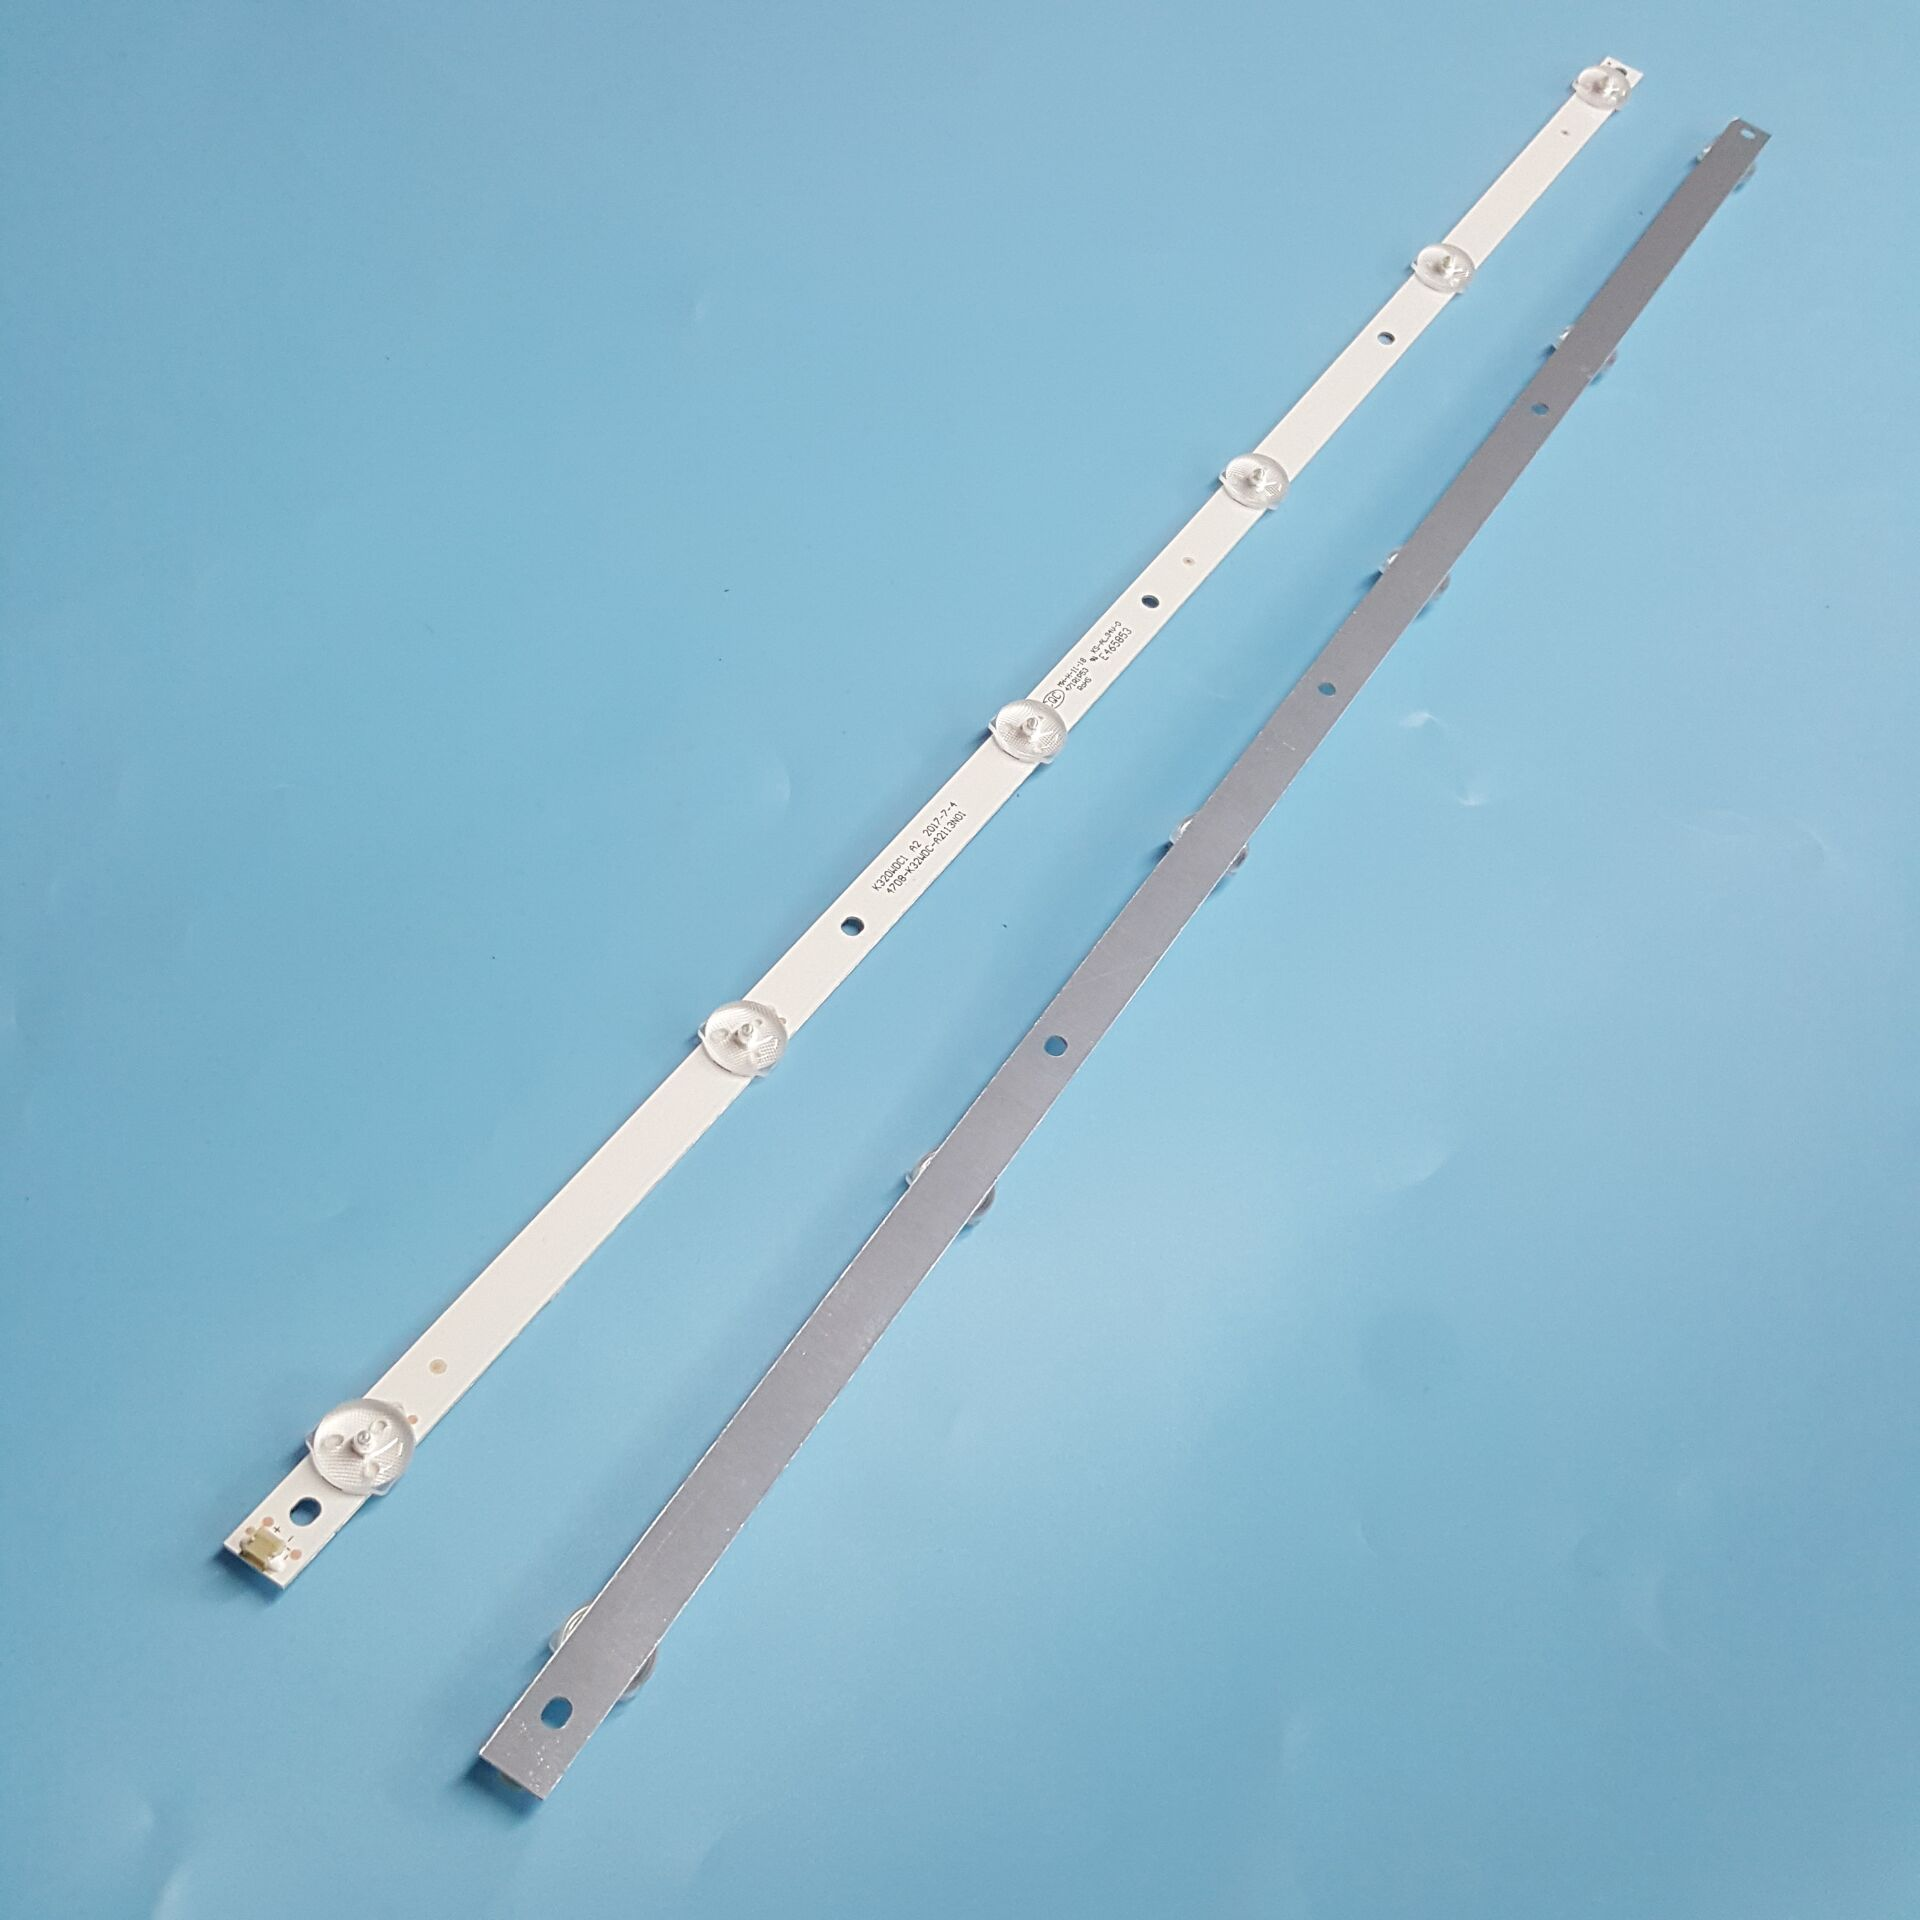 LED Backlight Strip 6 Lamp For HUGO 32inch K320WDC1 A2 4708-K32WDC-A2113N01 6LED 583MM TX-32ER250ZZ K320WDC2B